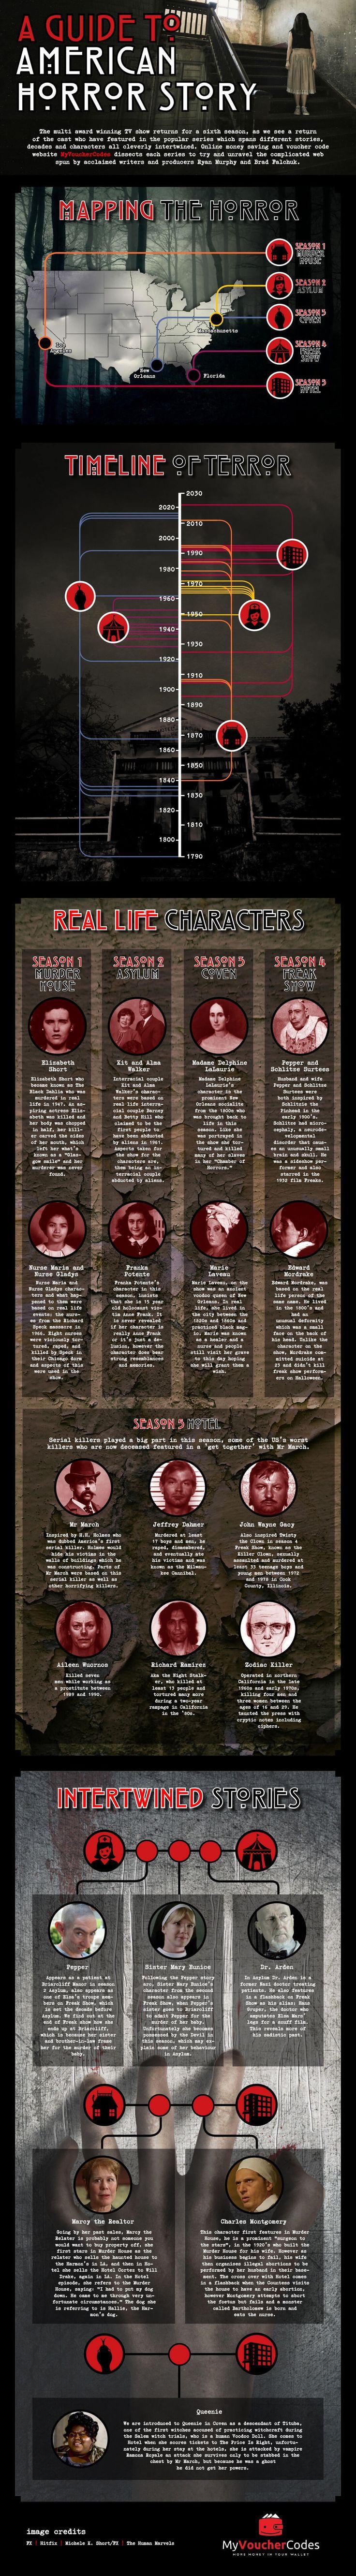 @MyVoucherCodes American Horror Story Infographic #AHS #Horror #TV